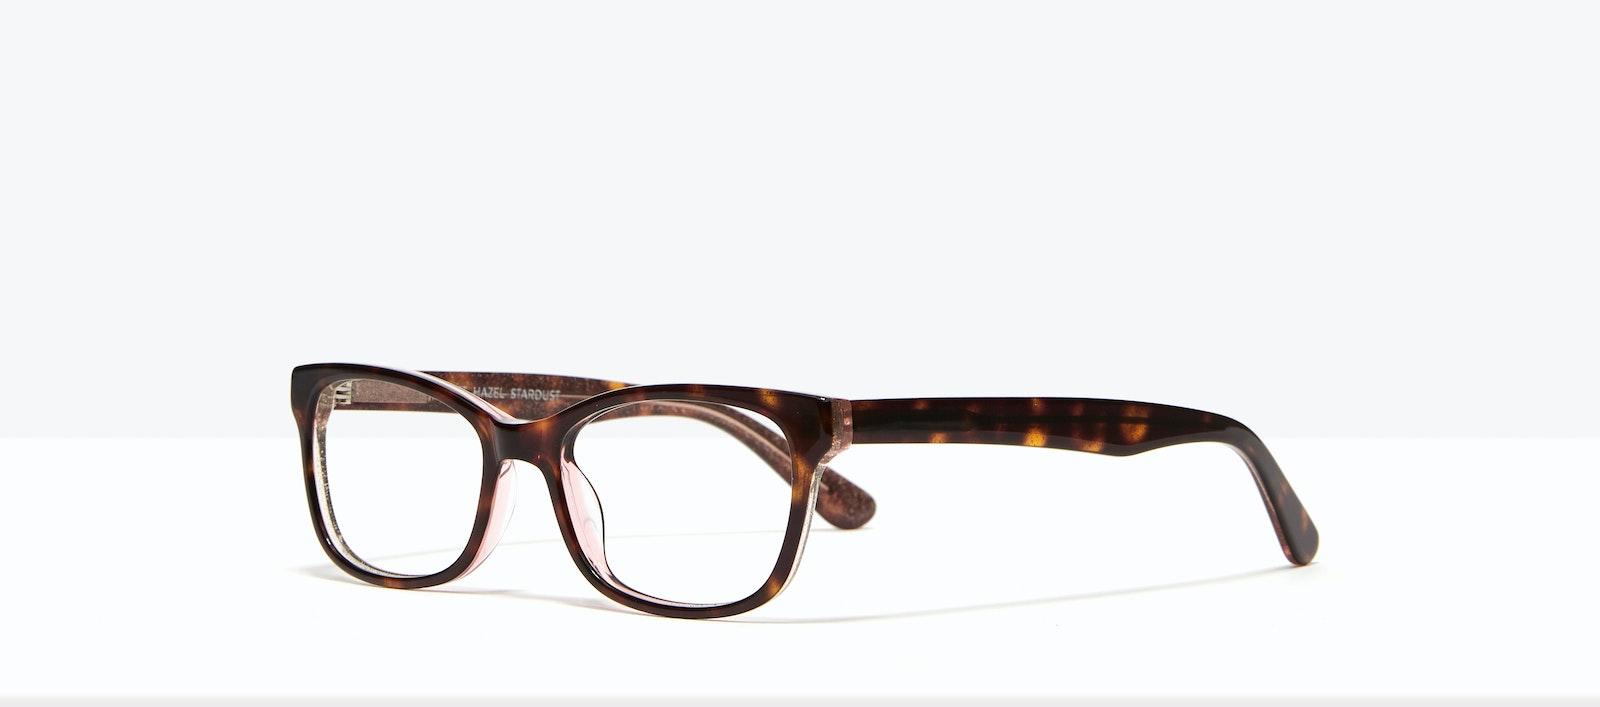 Affordable Fashion Glasses Rectangle Eyeglasses Women Comet II Hazel Stardust Tilt